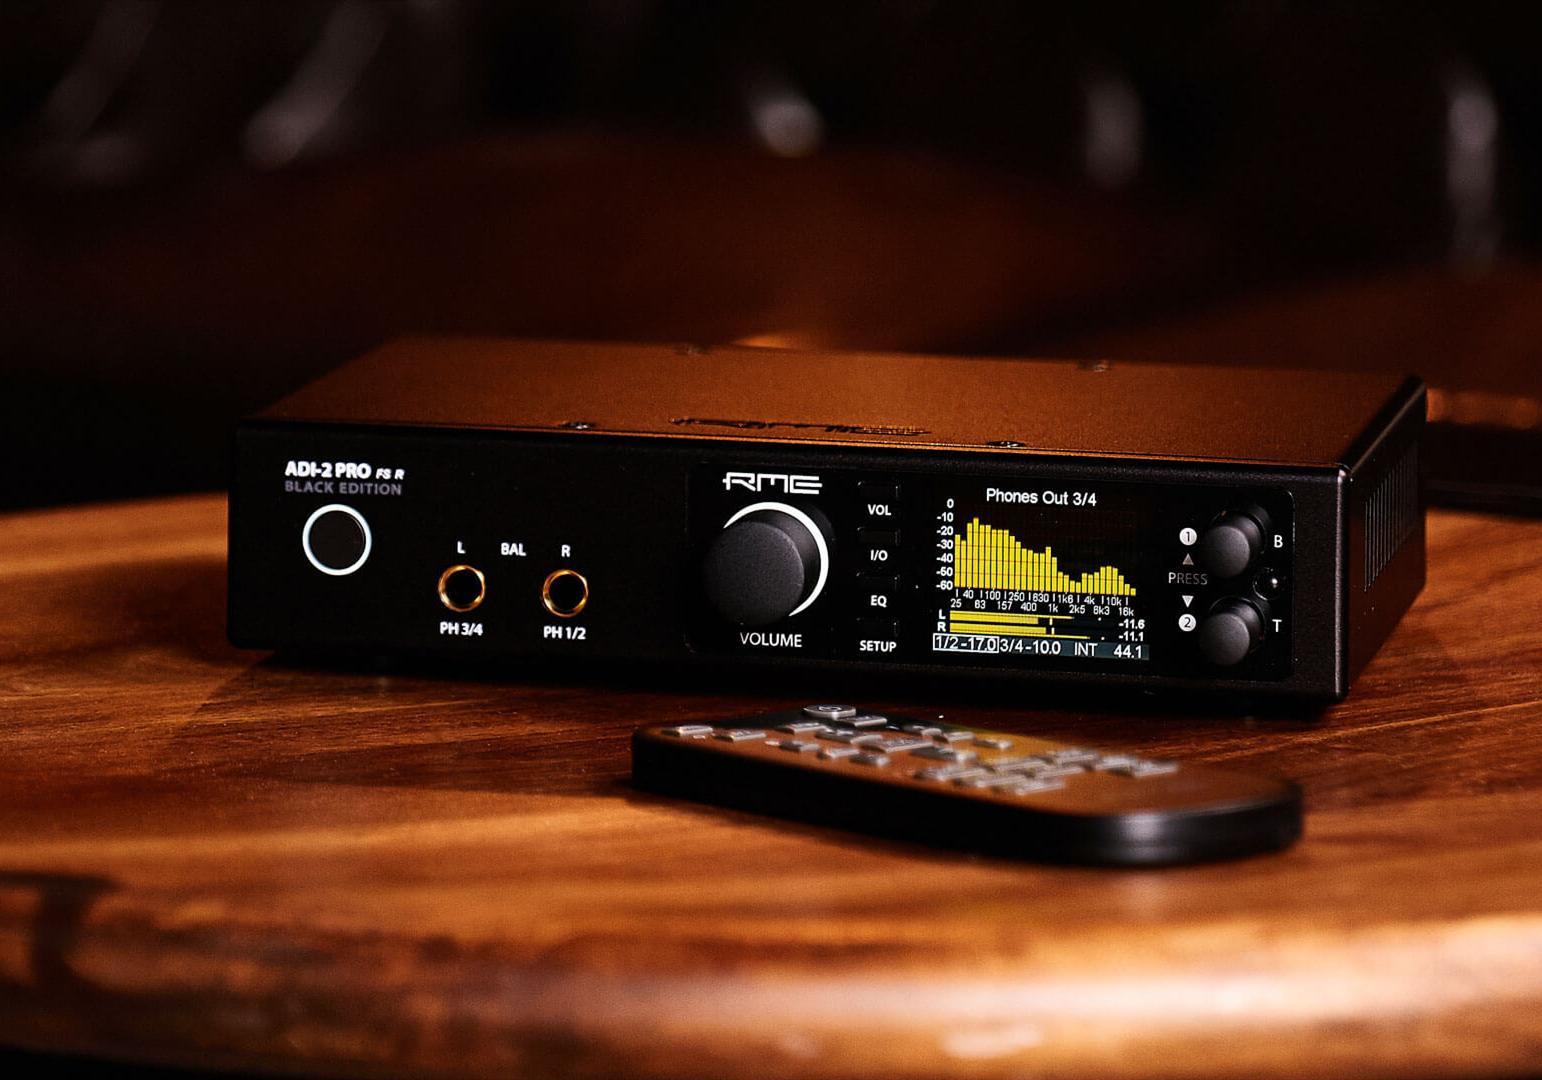 RME ADI-2 FS DAC&耳放 详细评测